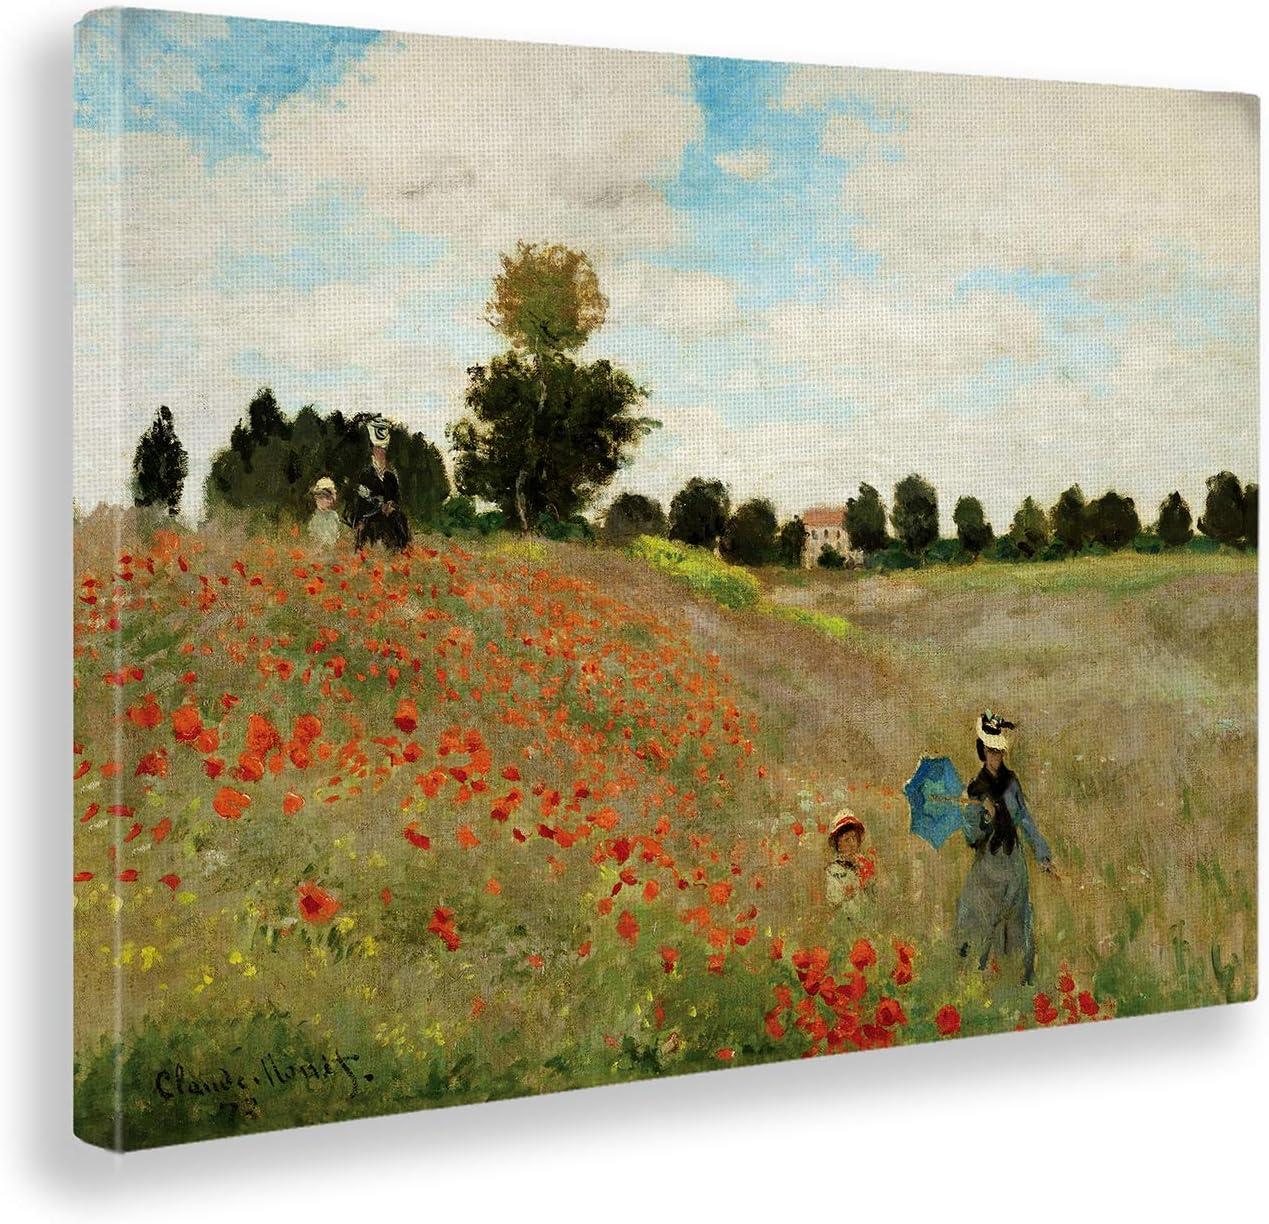 Giallobus - Cuadro - Claude Monet - Campo de Amapolas 2 - Estampado en Lienzo - Listo para Colgar - Varios tamaños - 140X100 cm